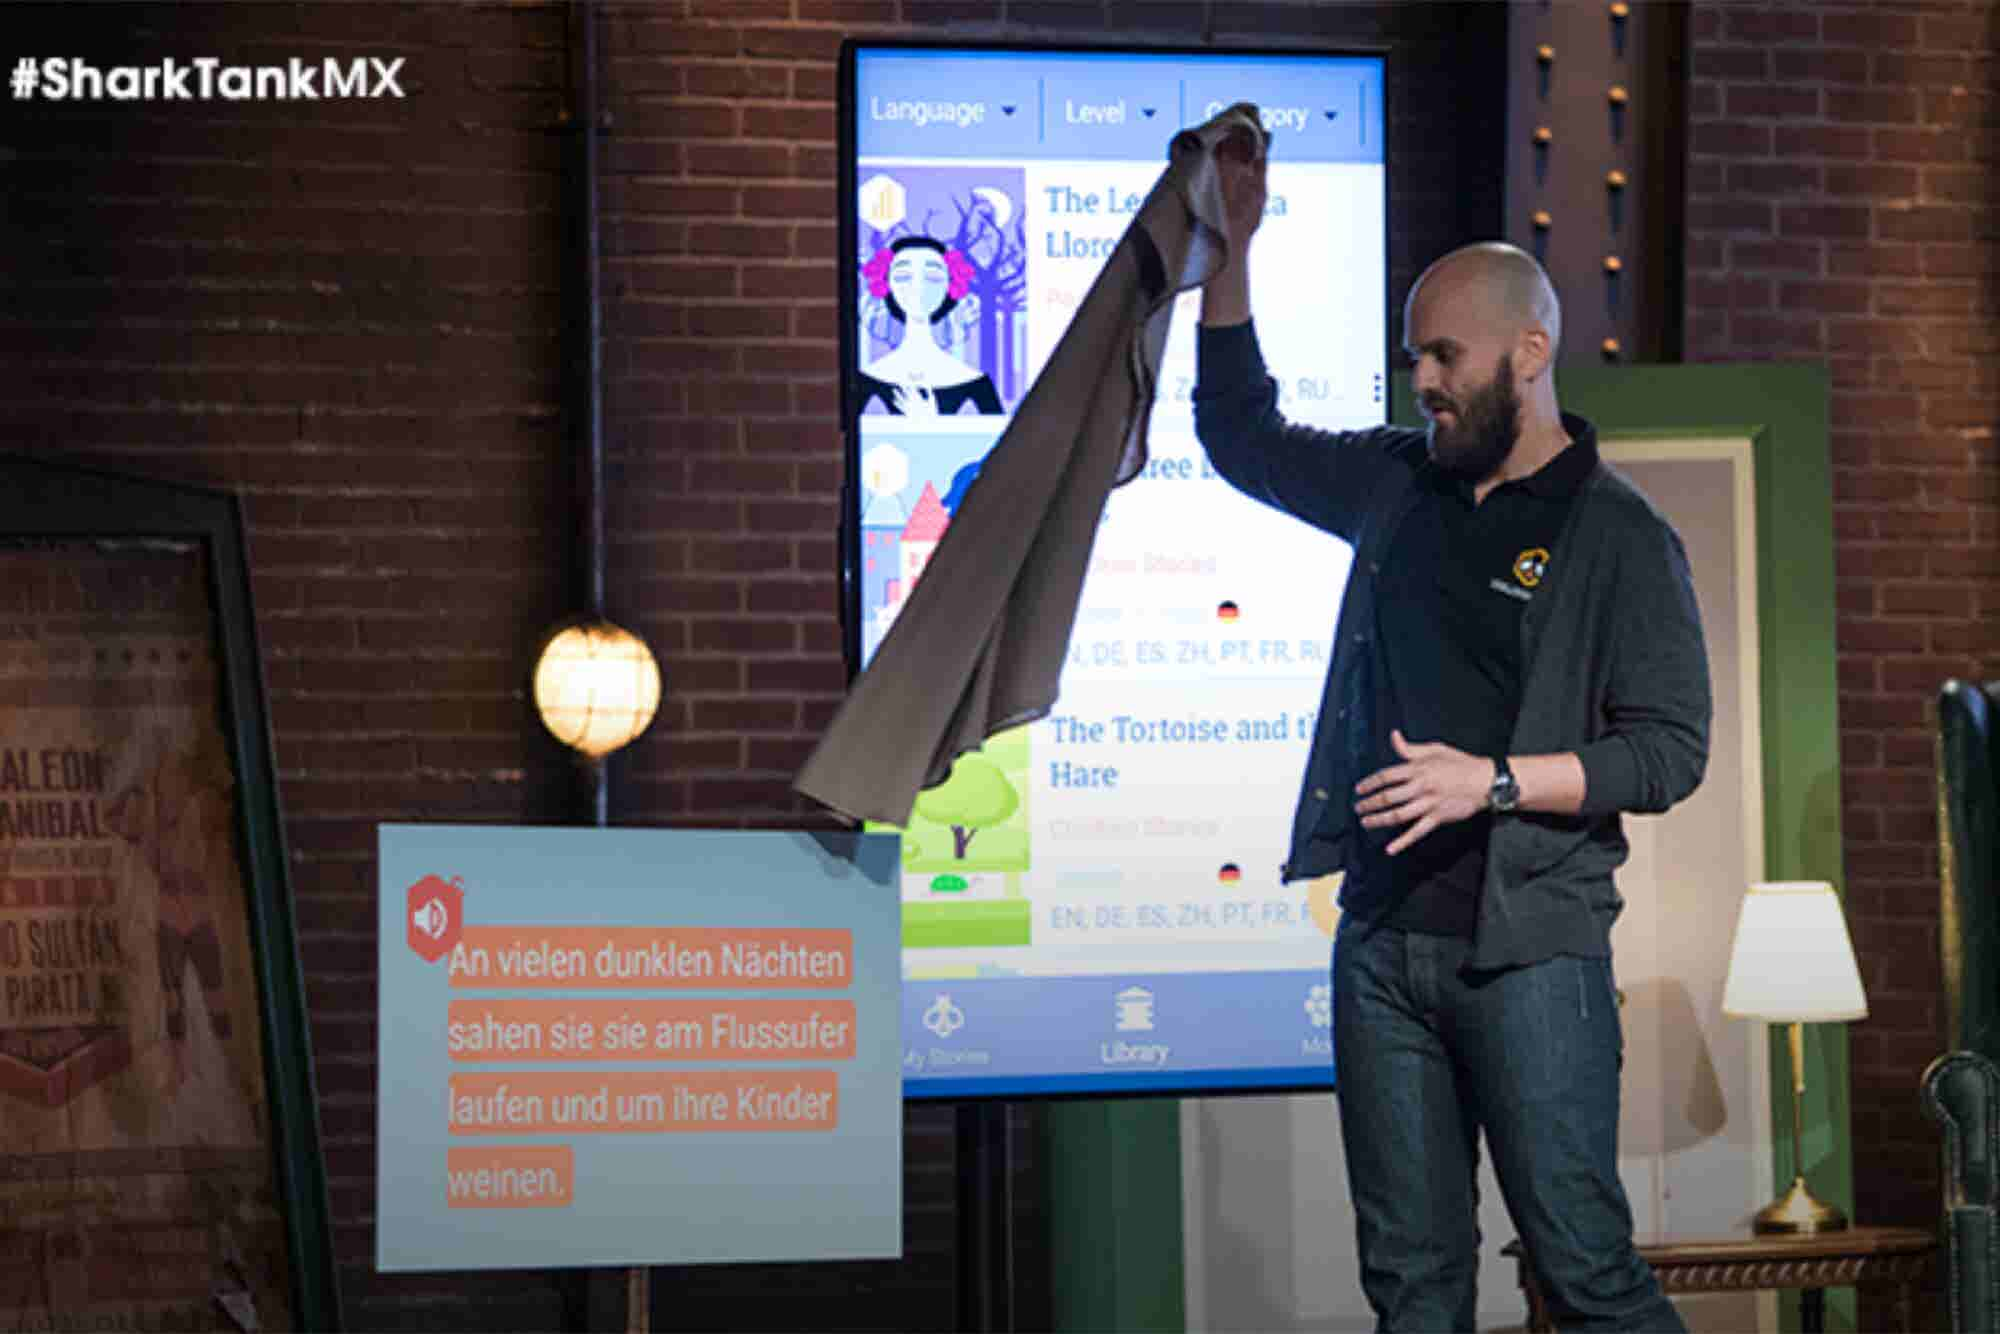 La app para aprender idiomas que consiguió 10 millones de pesos en Shark Tank México